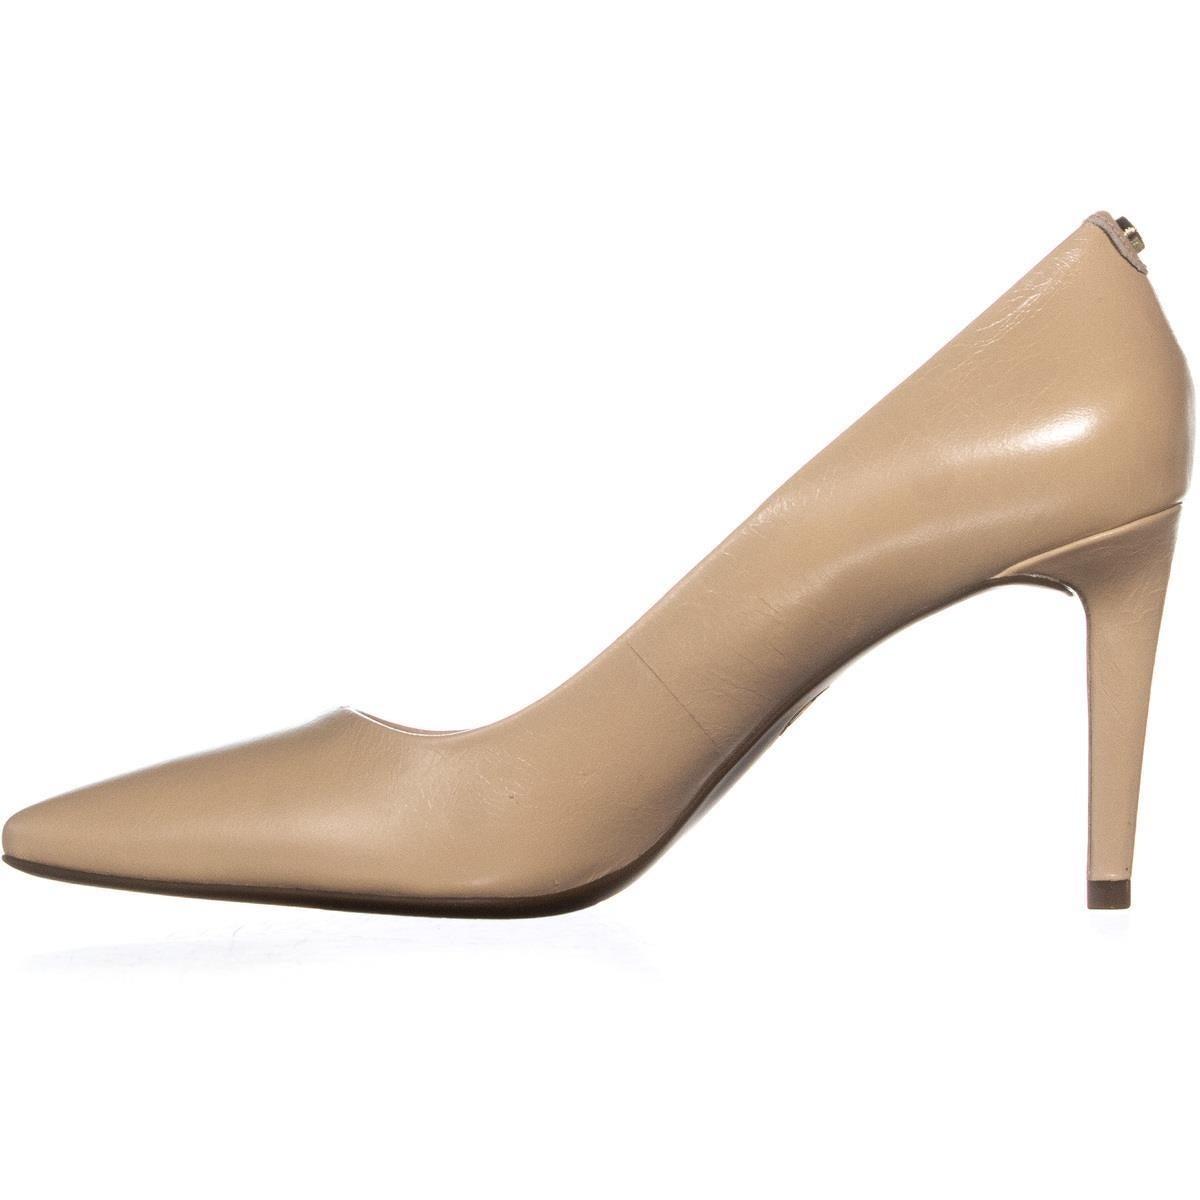 b4c988fbcf4 MICHAEL Michael Kors Dorothy Flex Pump Classic Heels, Oyster